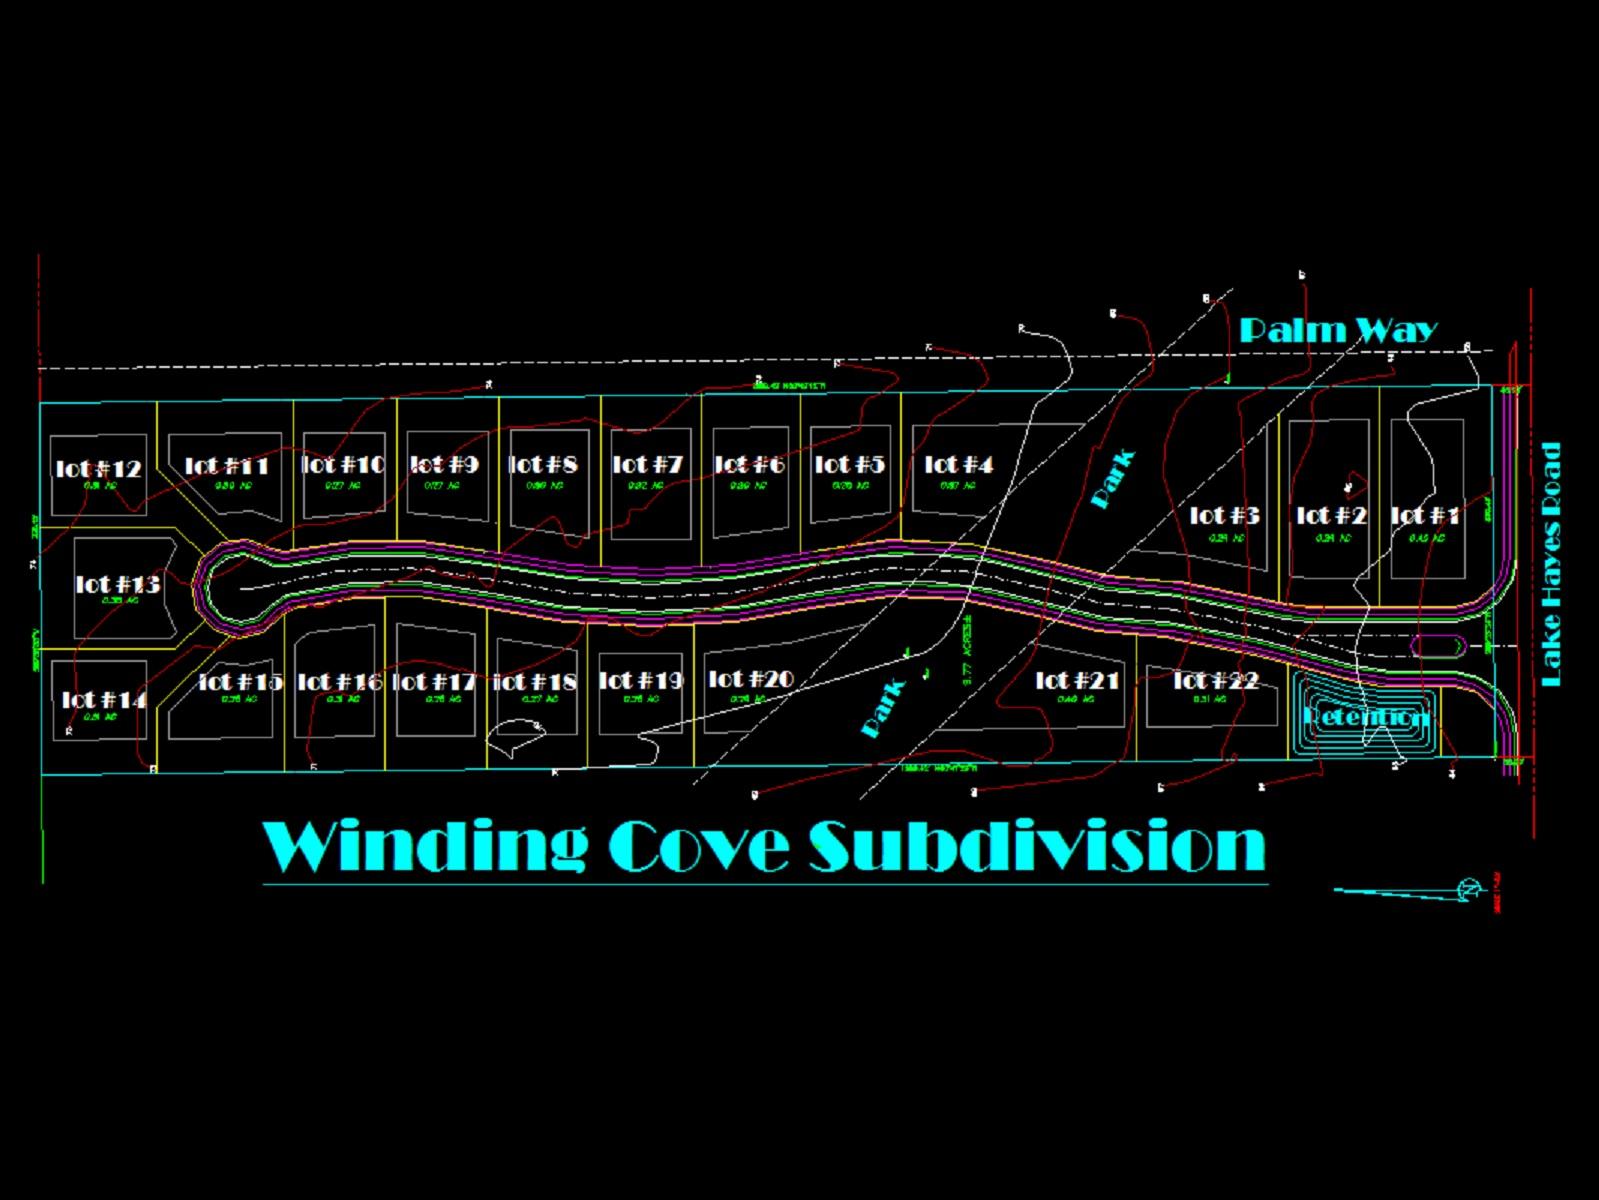 Winding Cove Plan